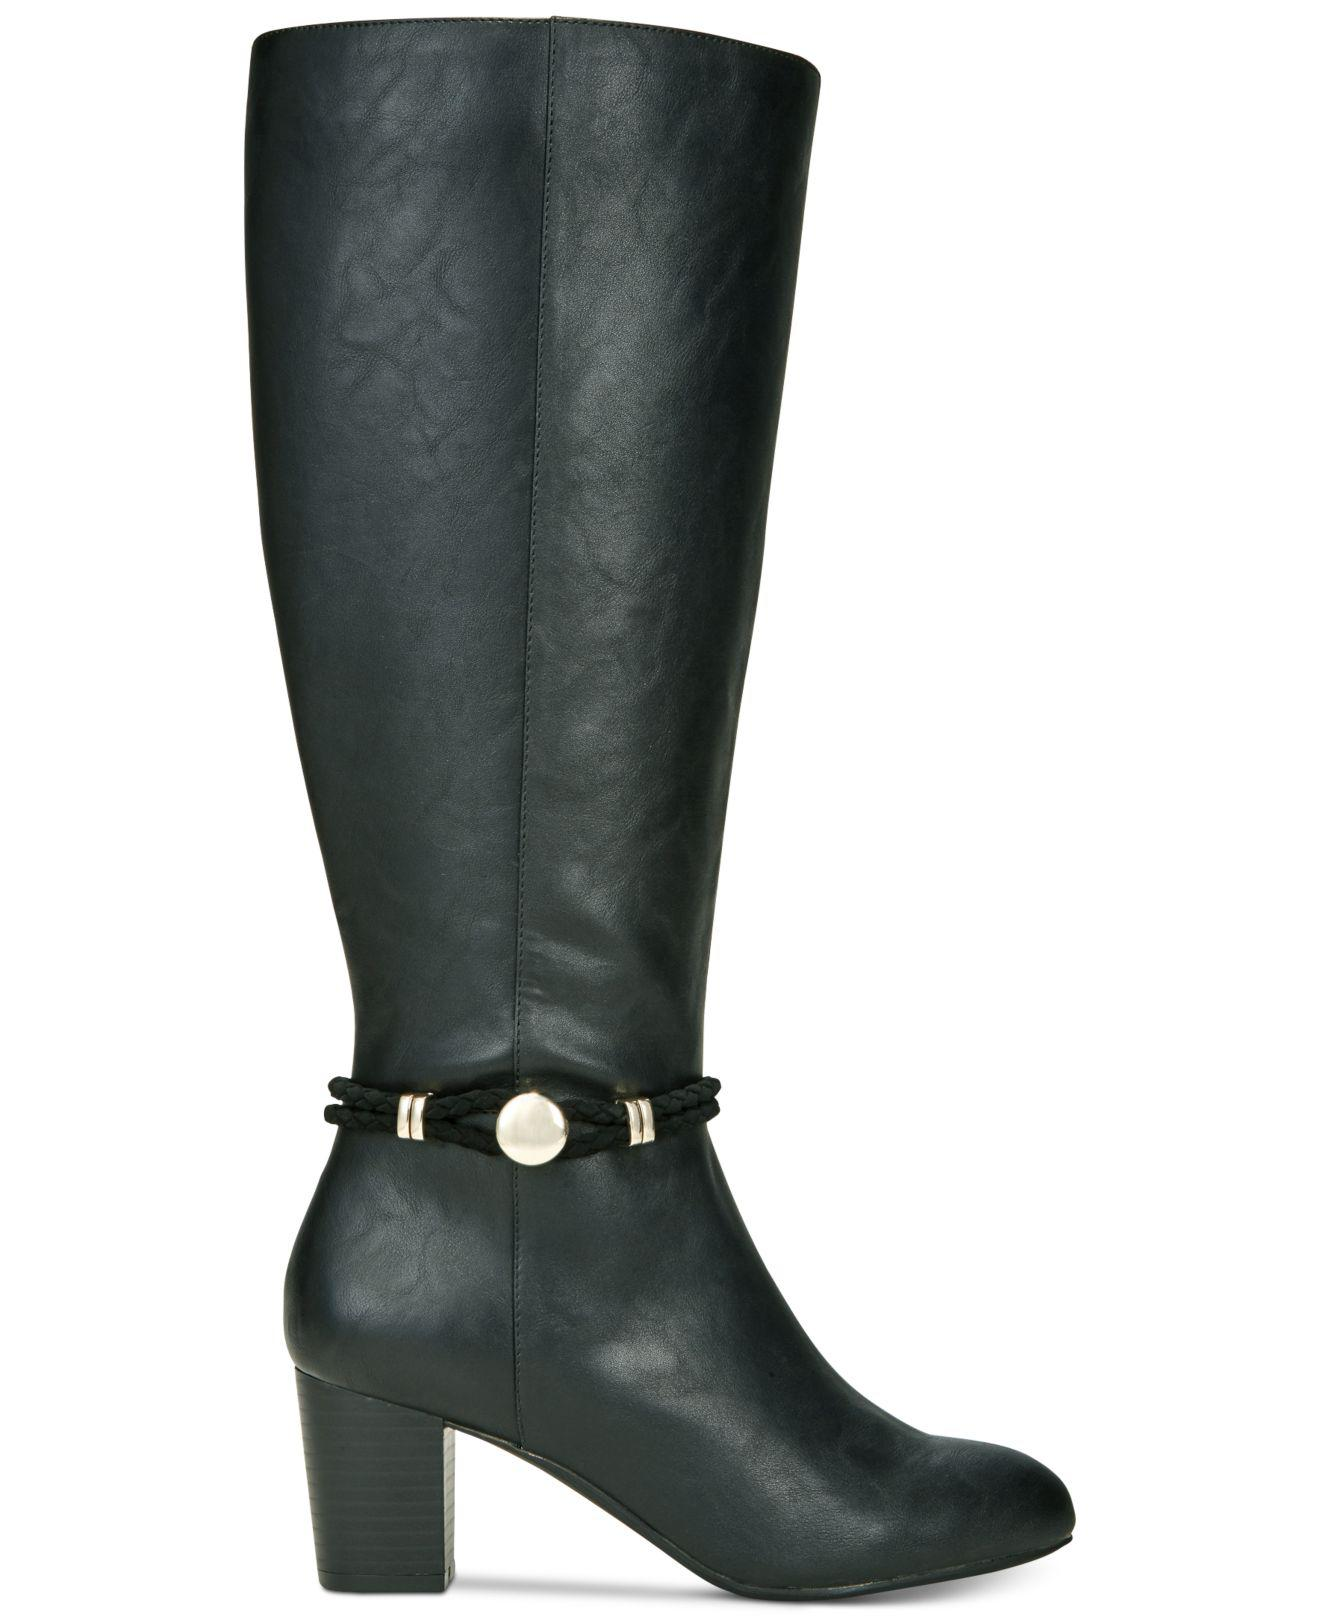 alti alla Toe donna di Karen Stivali Knee da Galee Almond Scott moda dqtff1x